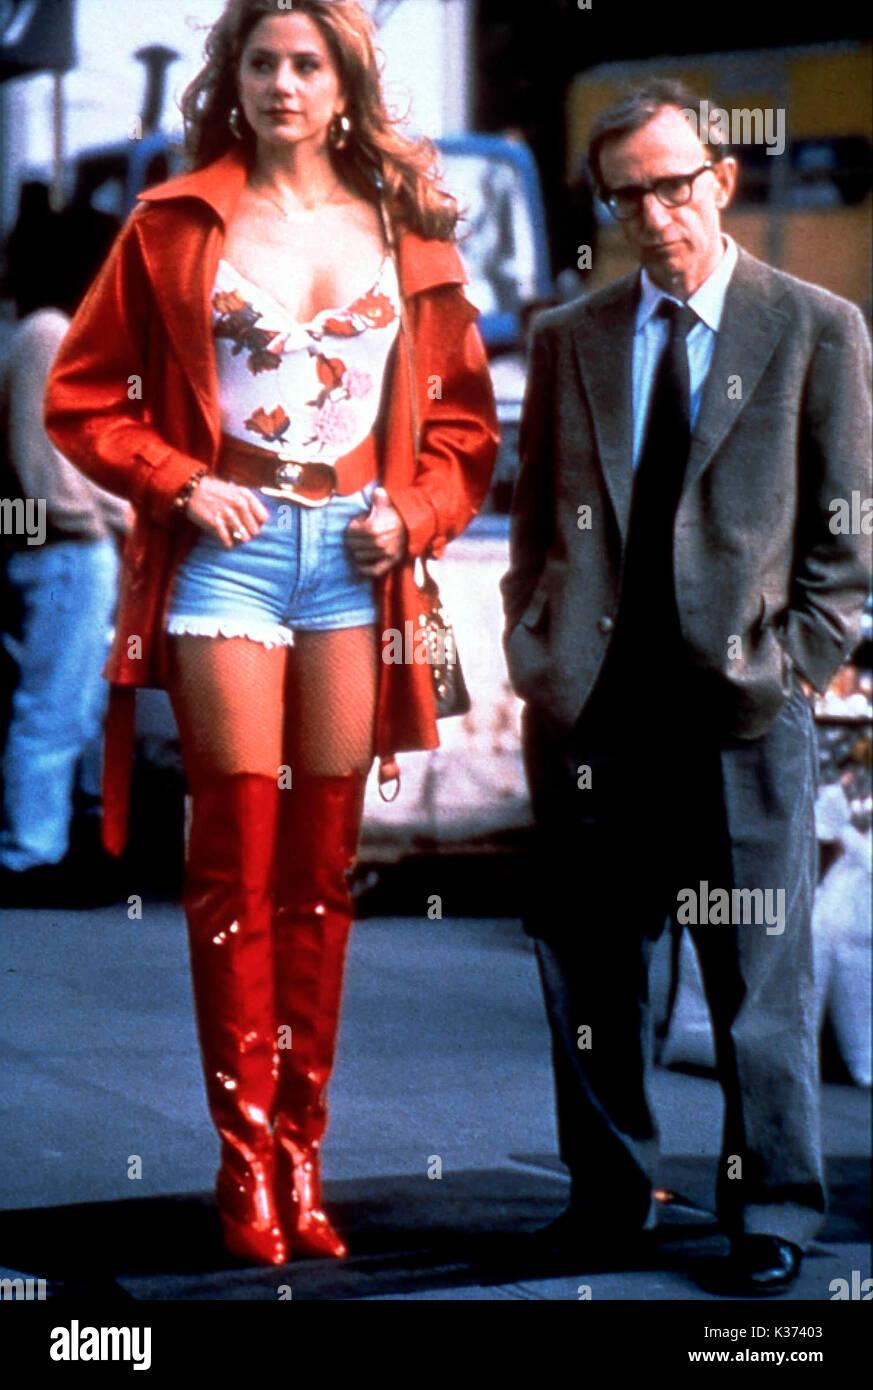 MIGHTY APHRODITE MIRA SORVINO, WOODY ALLEN     Date: 1995 - Stock Image